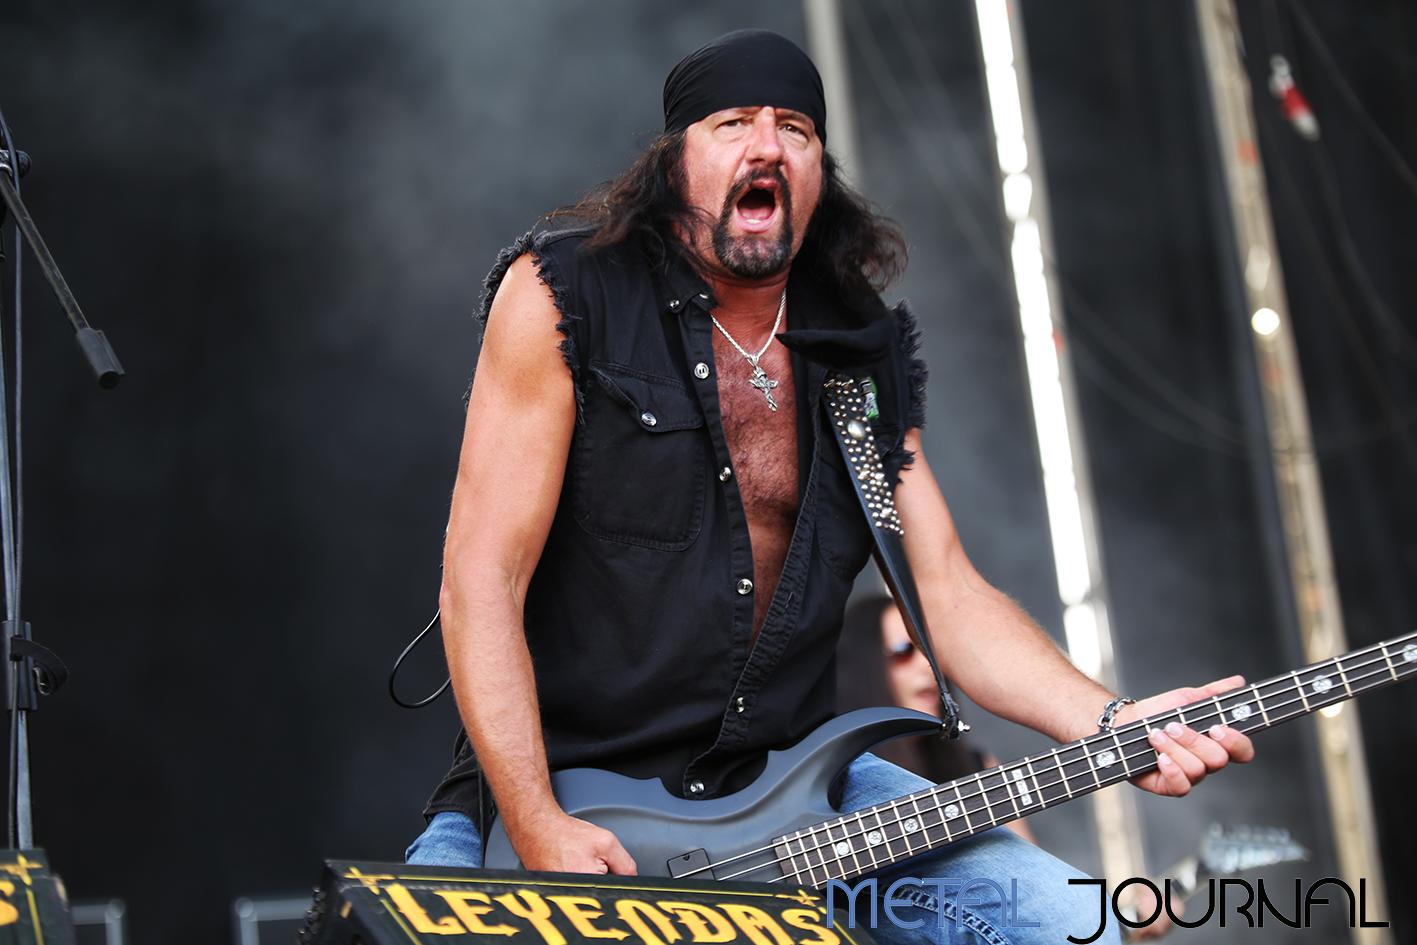 metal church - leyendas del rock 2019 metal journal pic 7